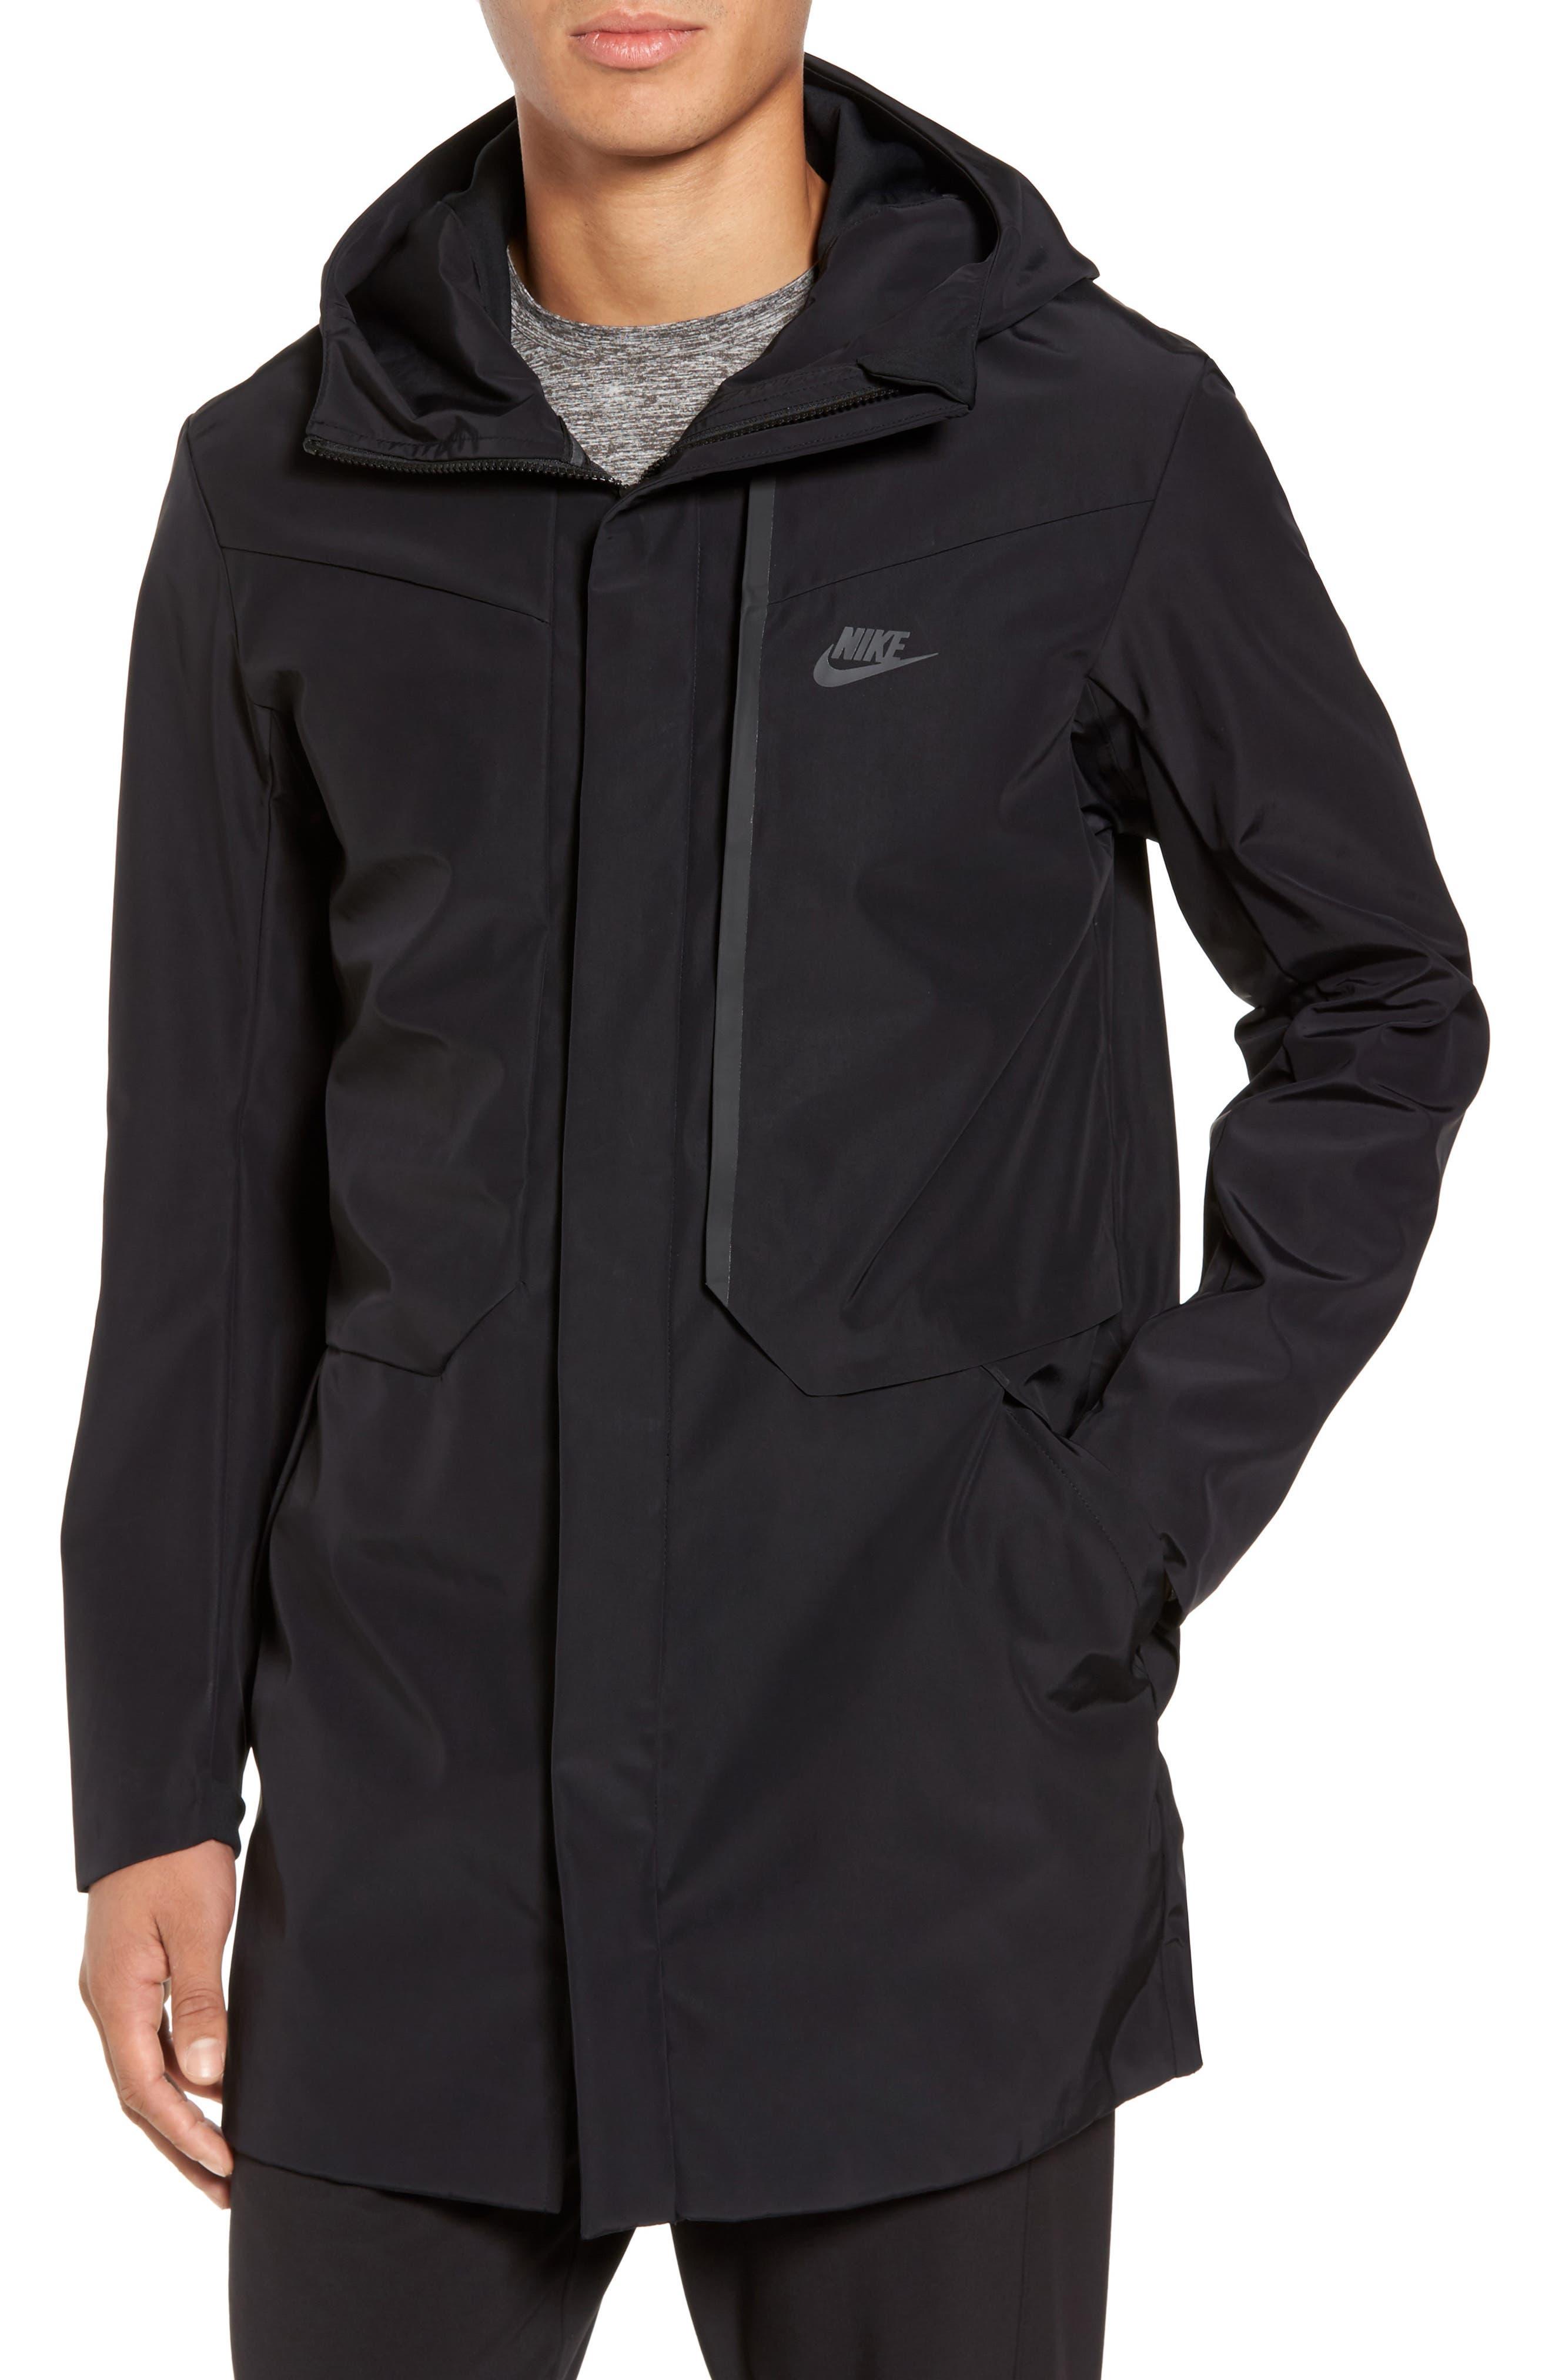 Alternate Image 1 Selected - Nike NSW Tech Track Jacket